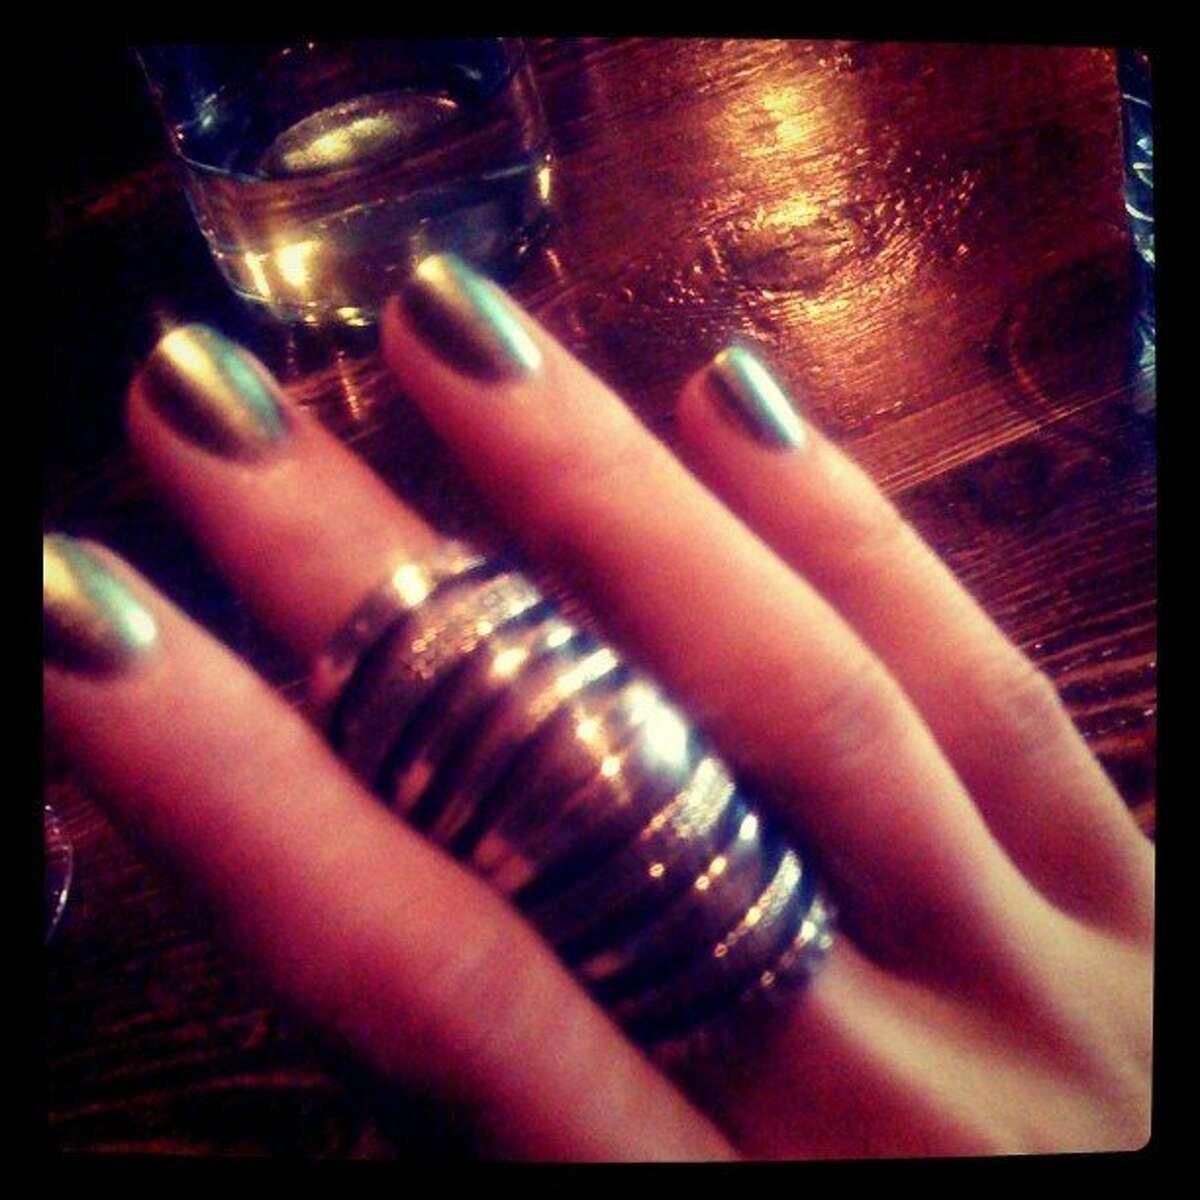 New gold/green Chanel polish